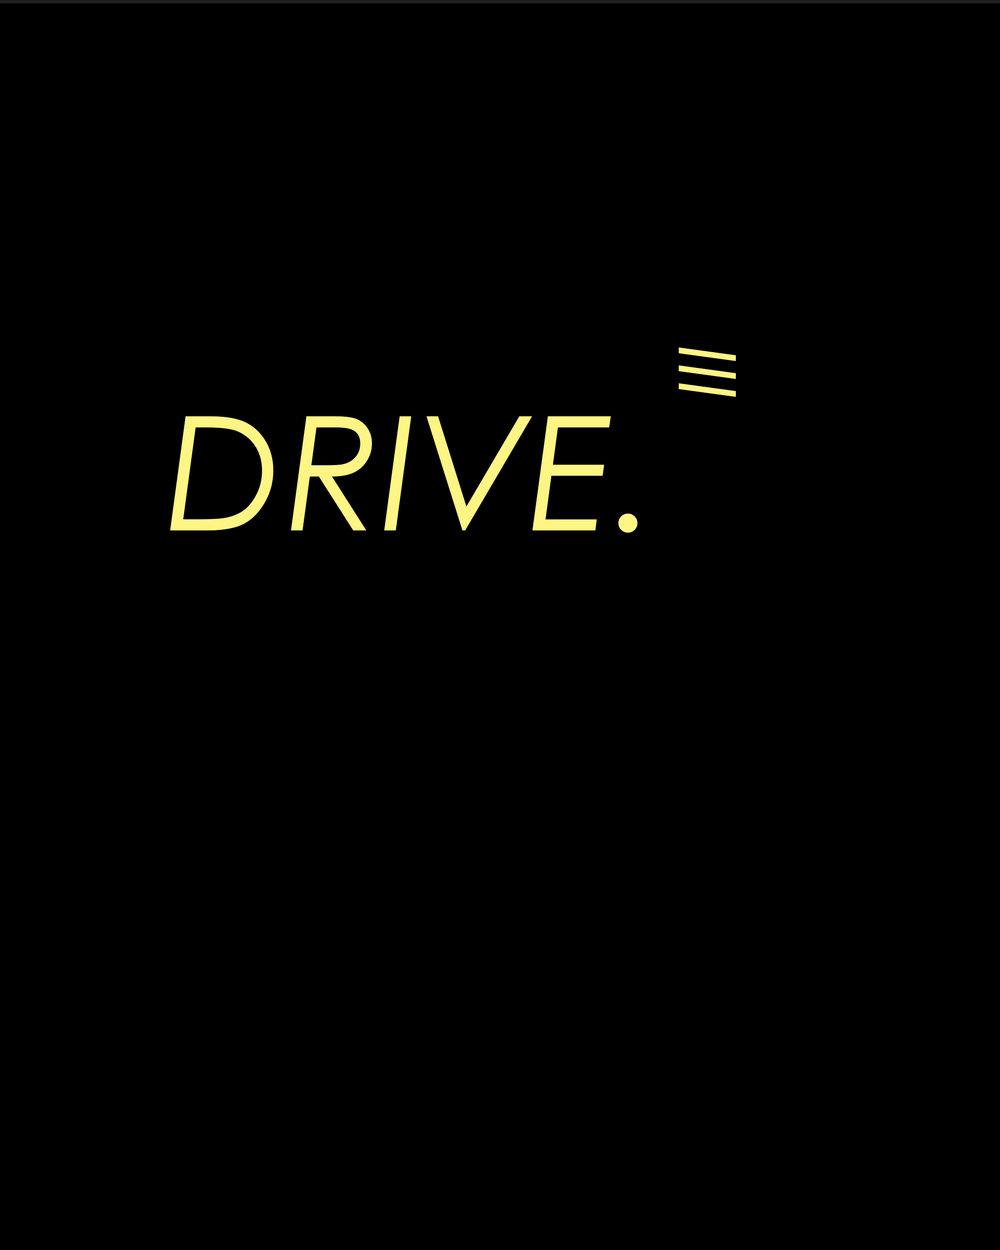 Drive Part III-0.jpg